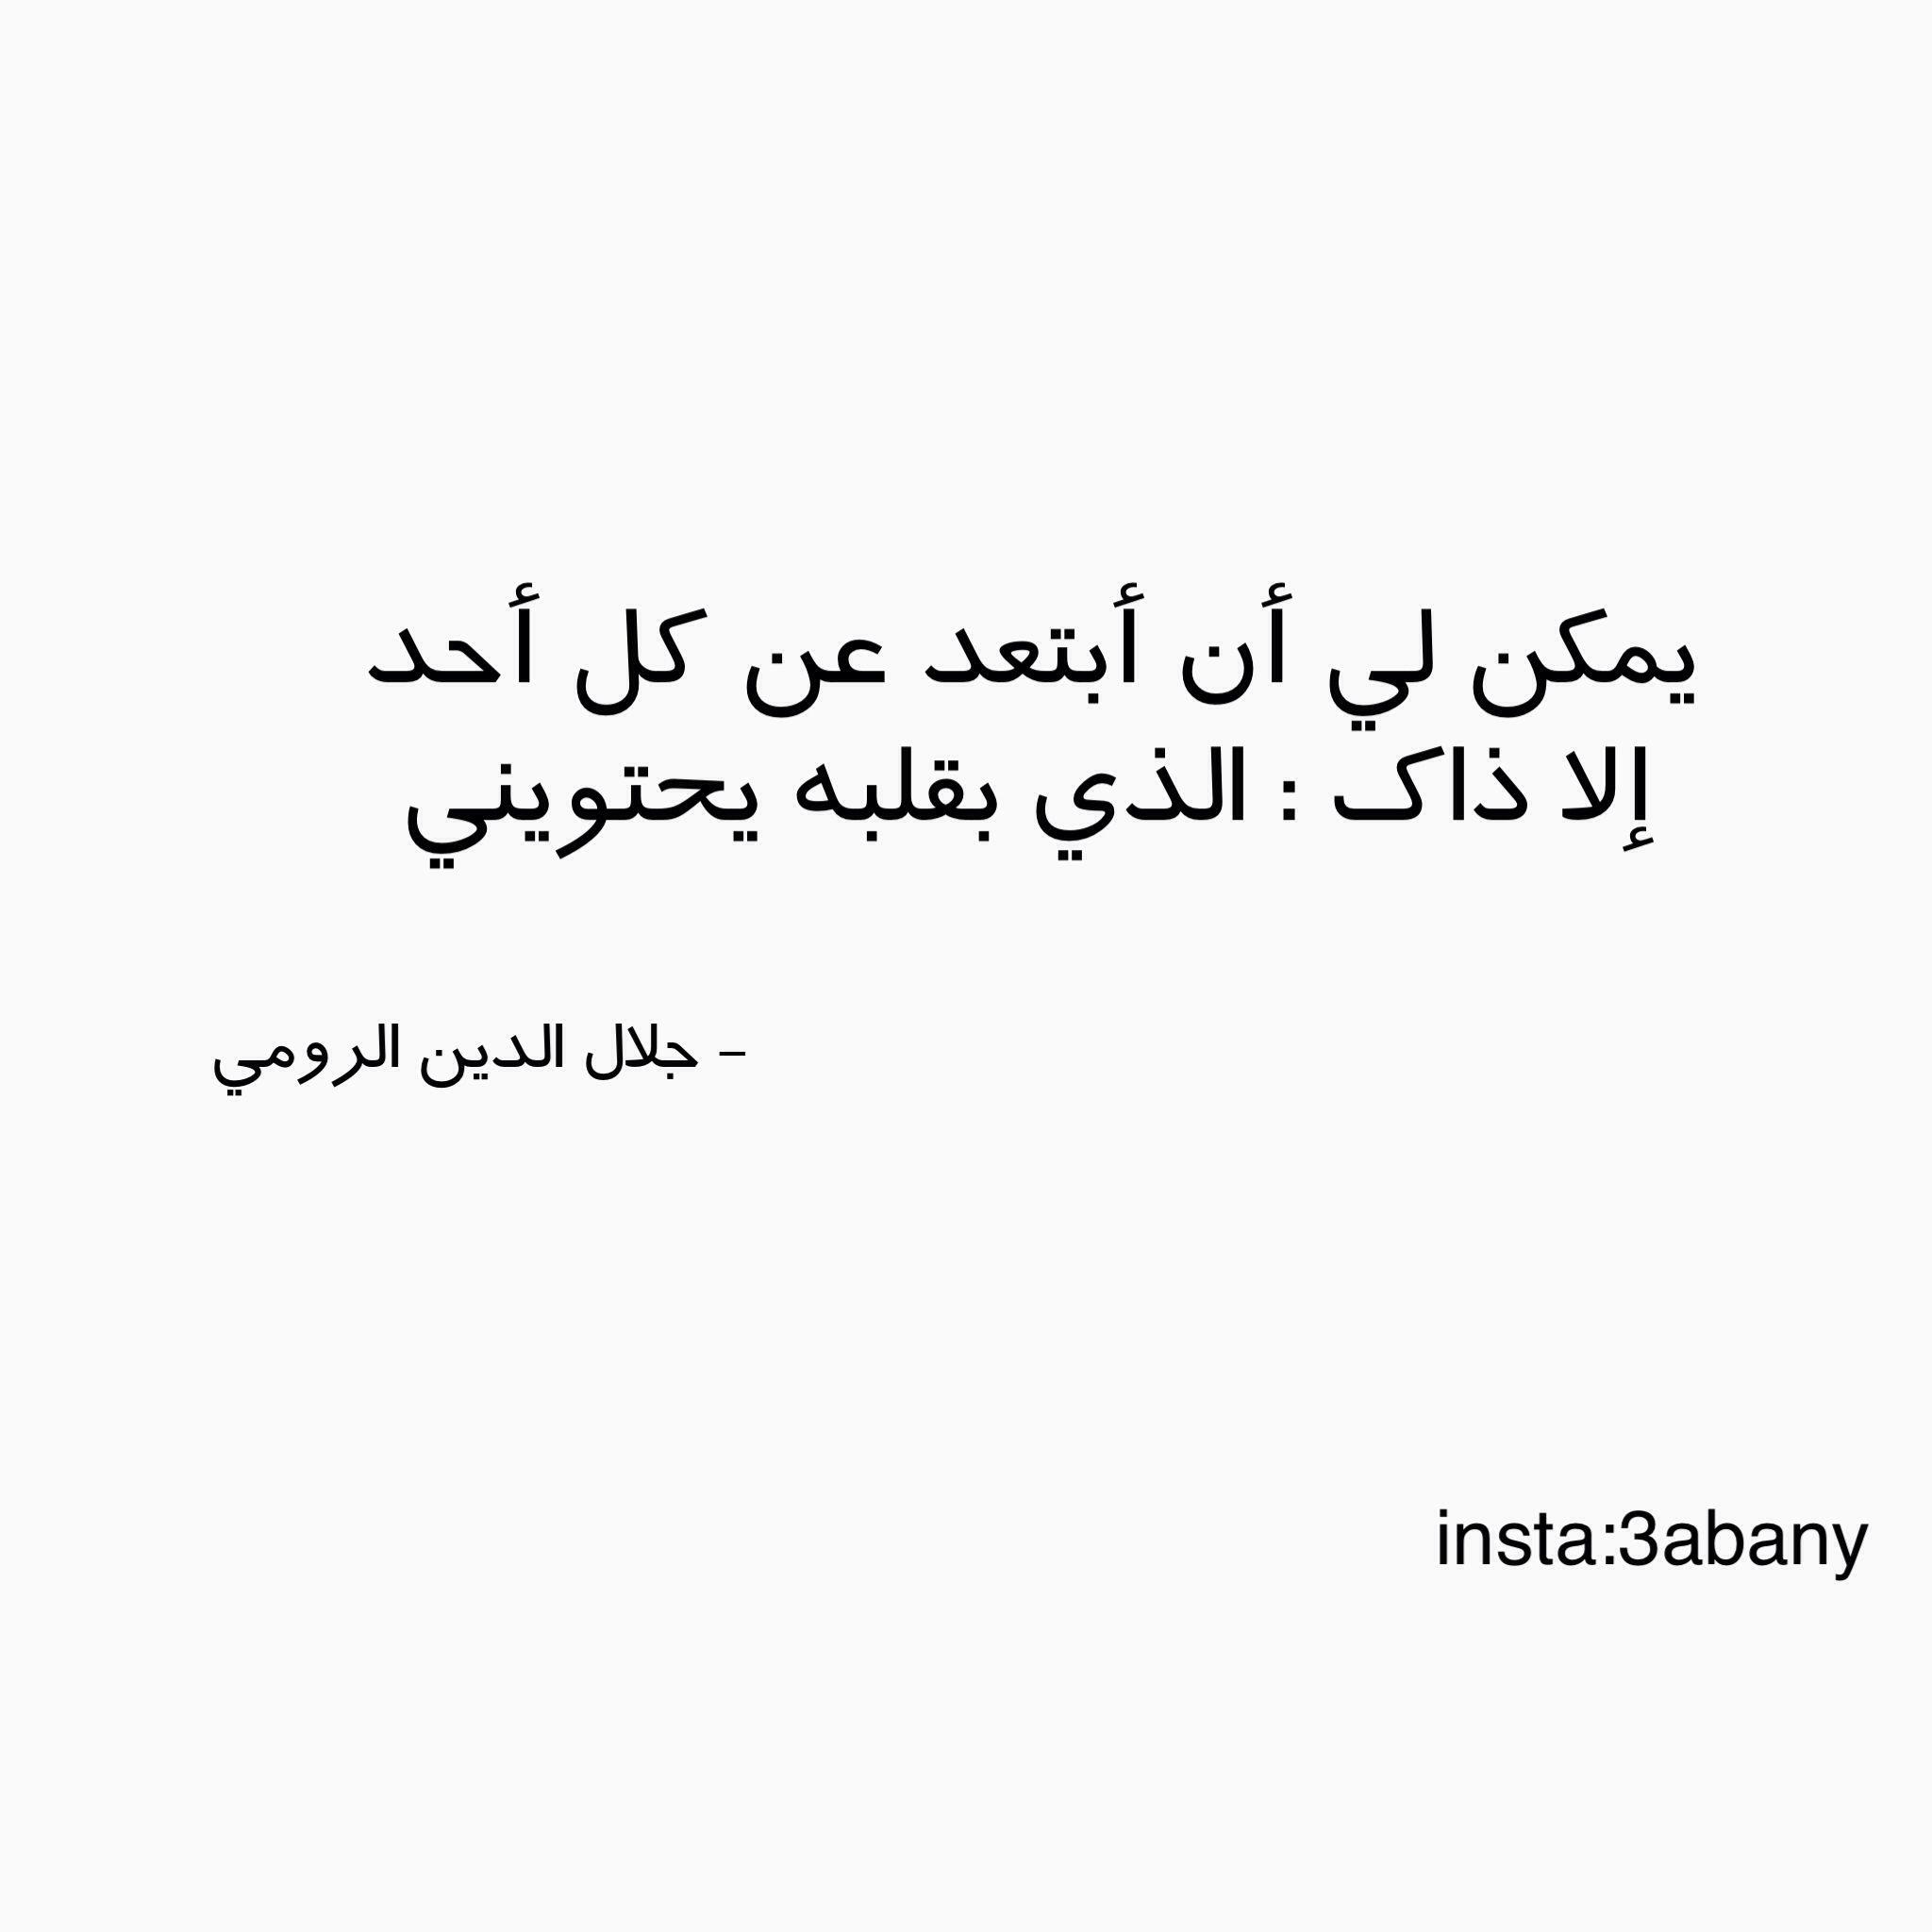 جلال الدين الرومي Lovely Quote Islamic Quotes Fabulous Quotes